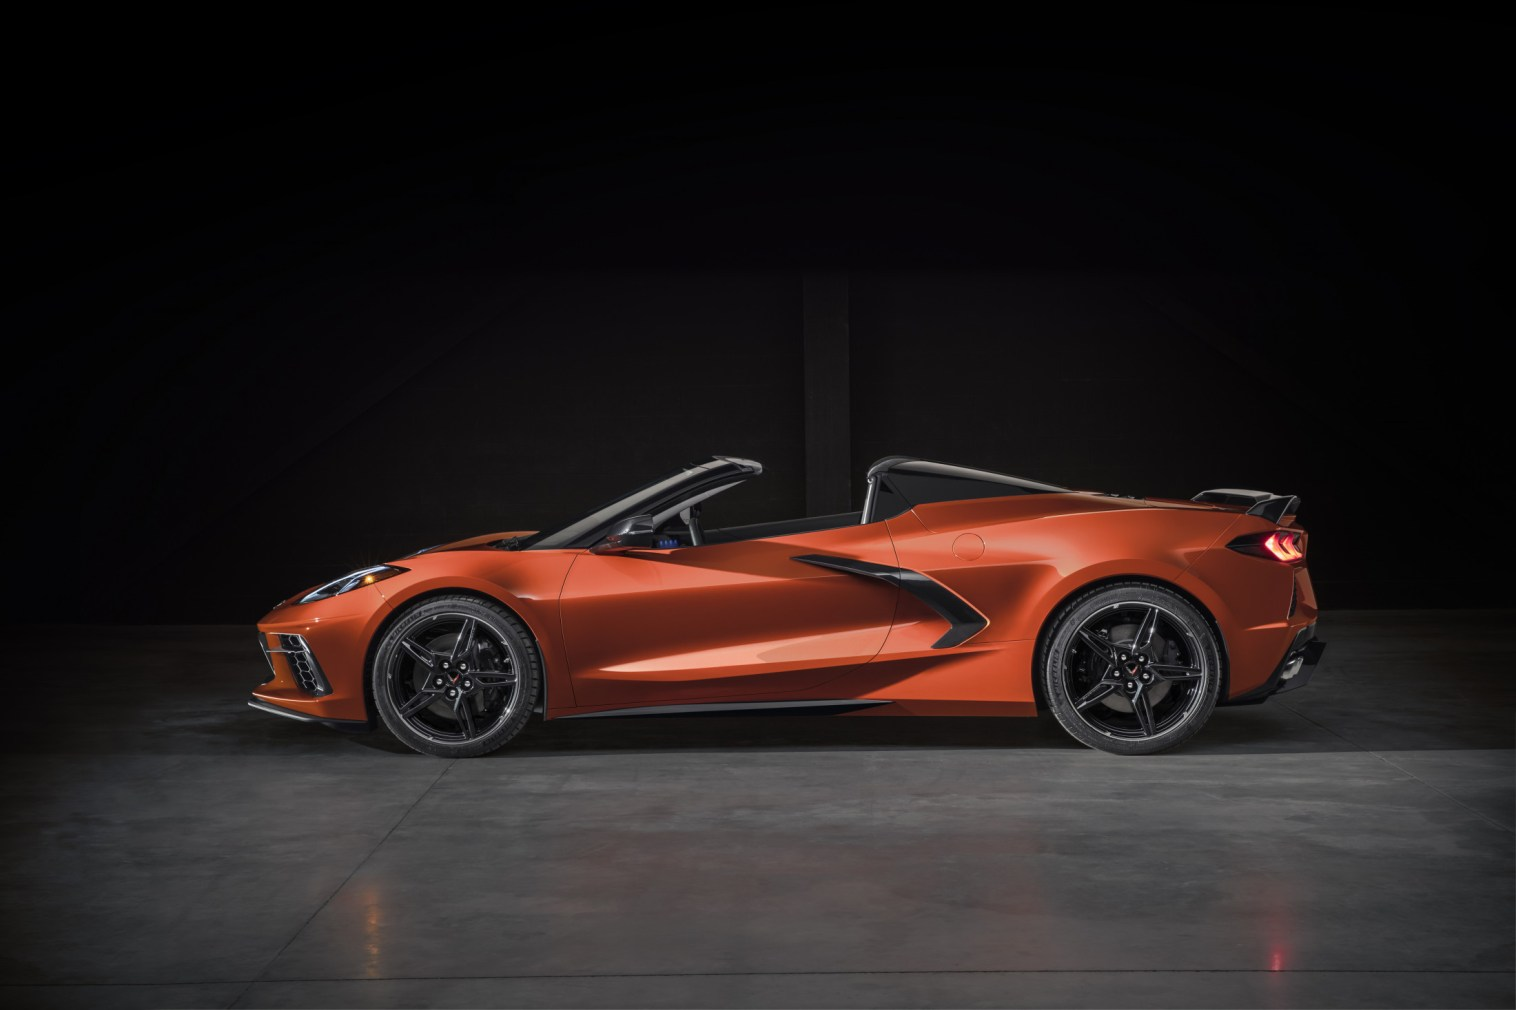 2020-Chevrolet-Corvette-Stingray-Convertible-009